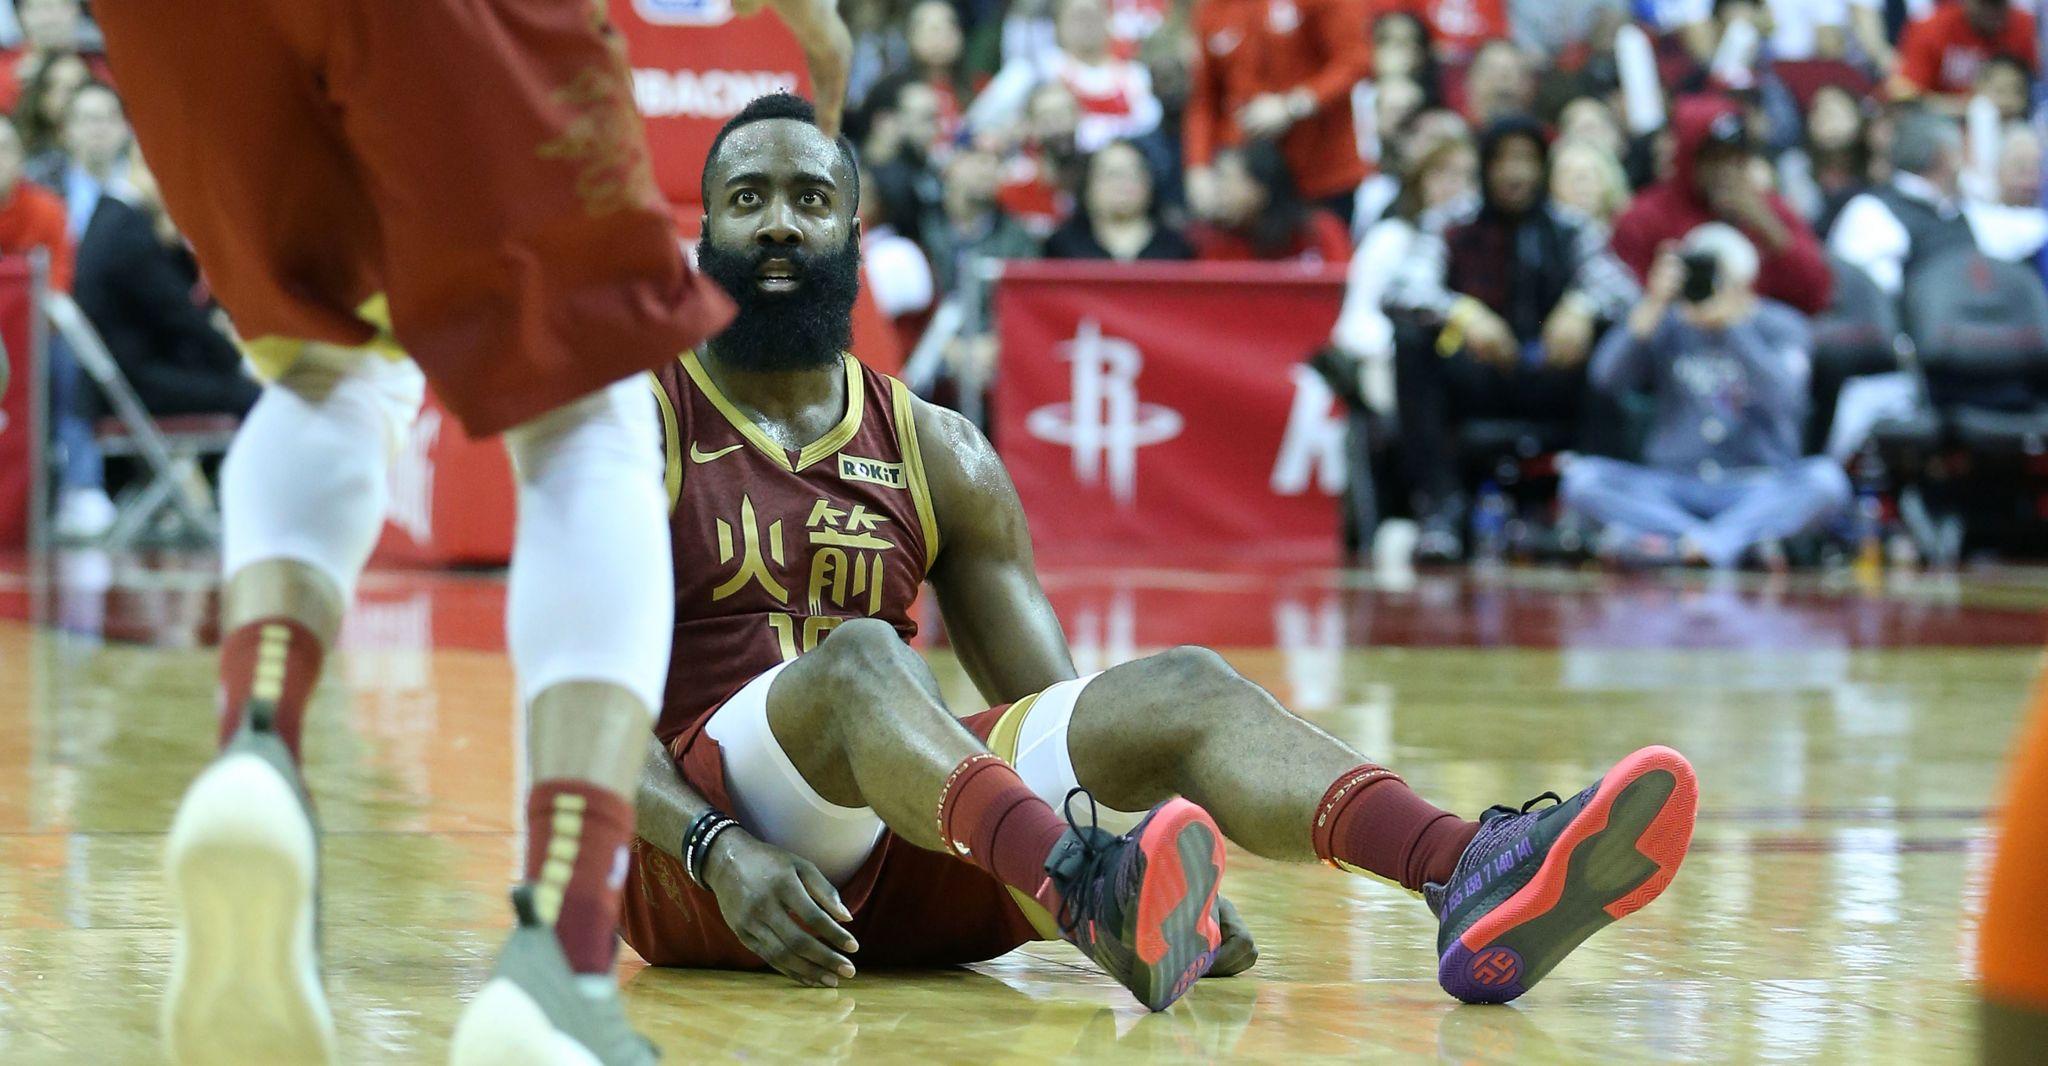 660b84e86ad4 James Harden s final shot misses as Rockets fall to Thunder - Houston  Chronicle